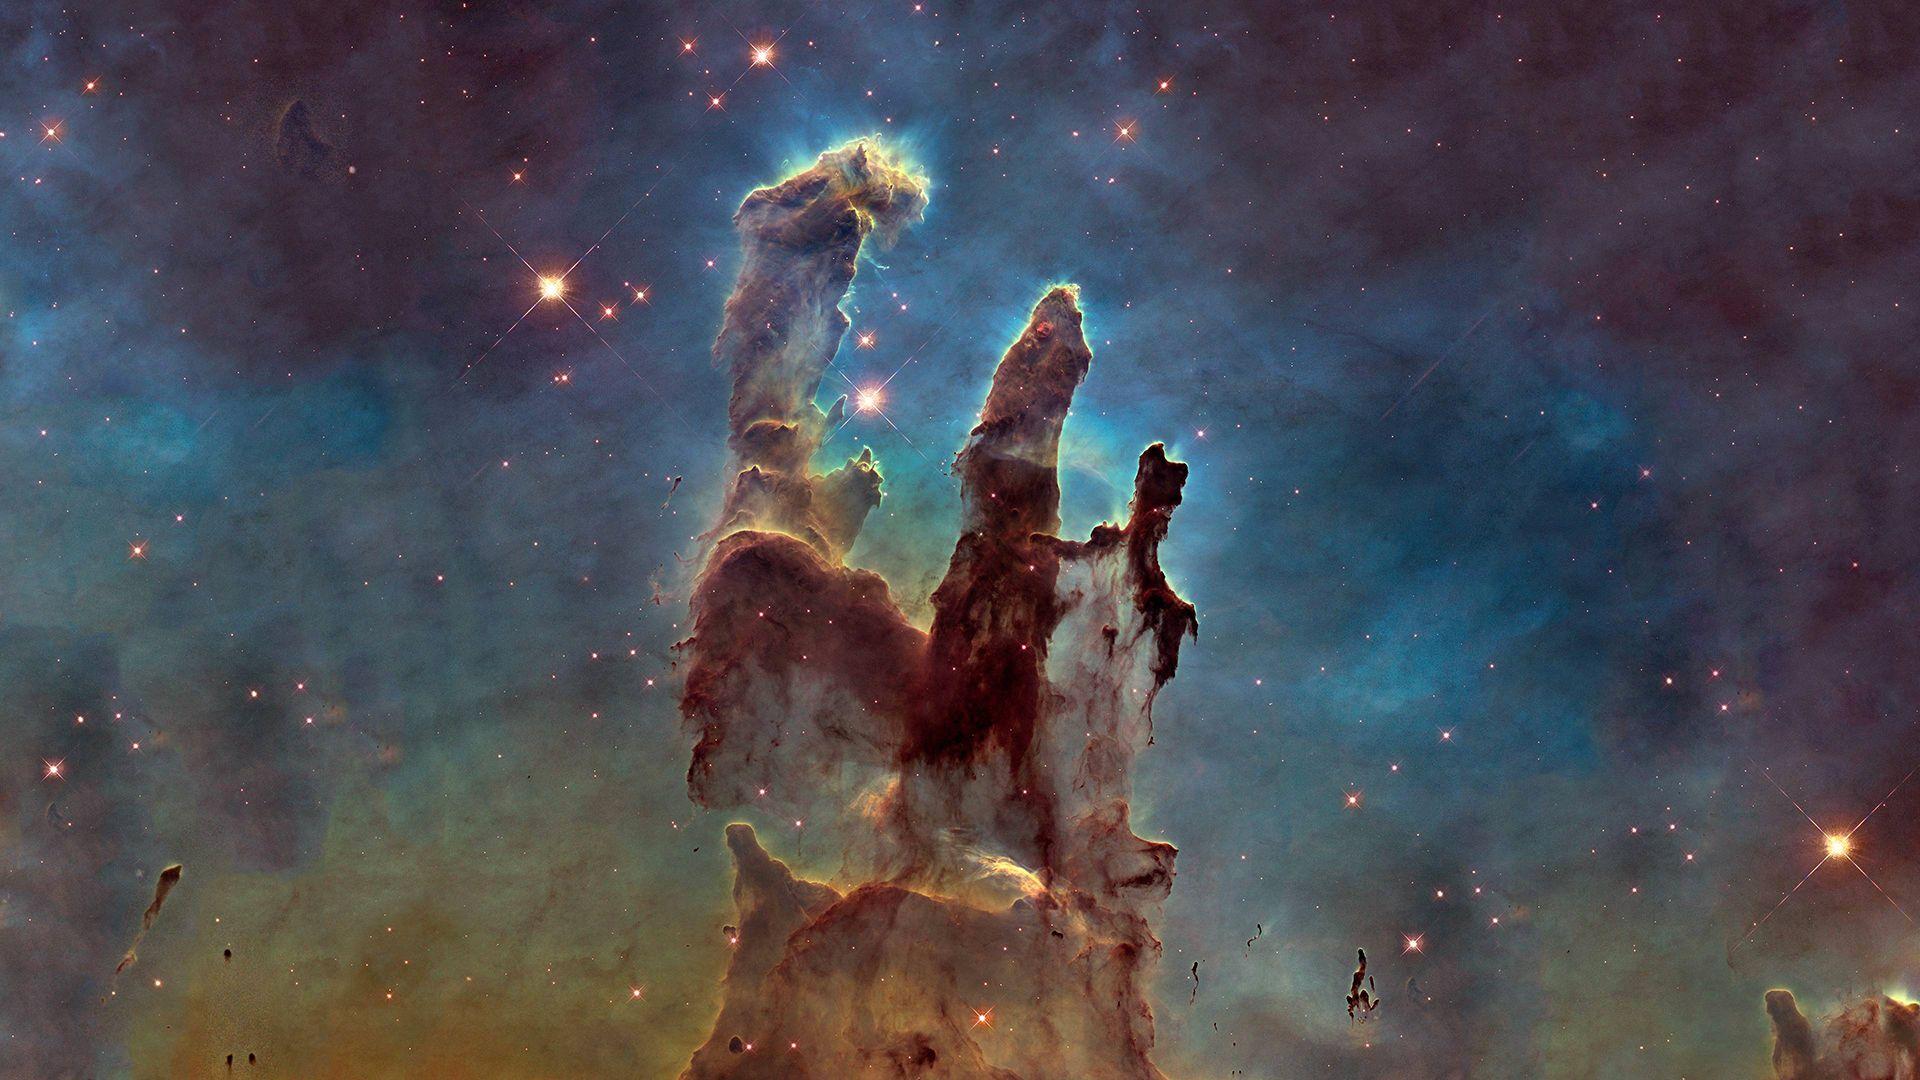 Nebula Pillars Of Creation (1920*1080) wallpapers